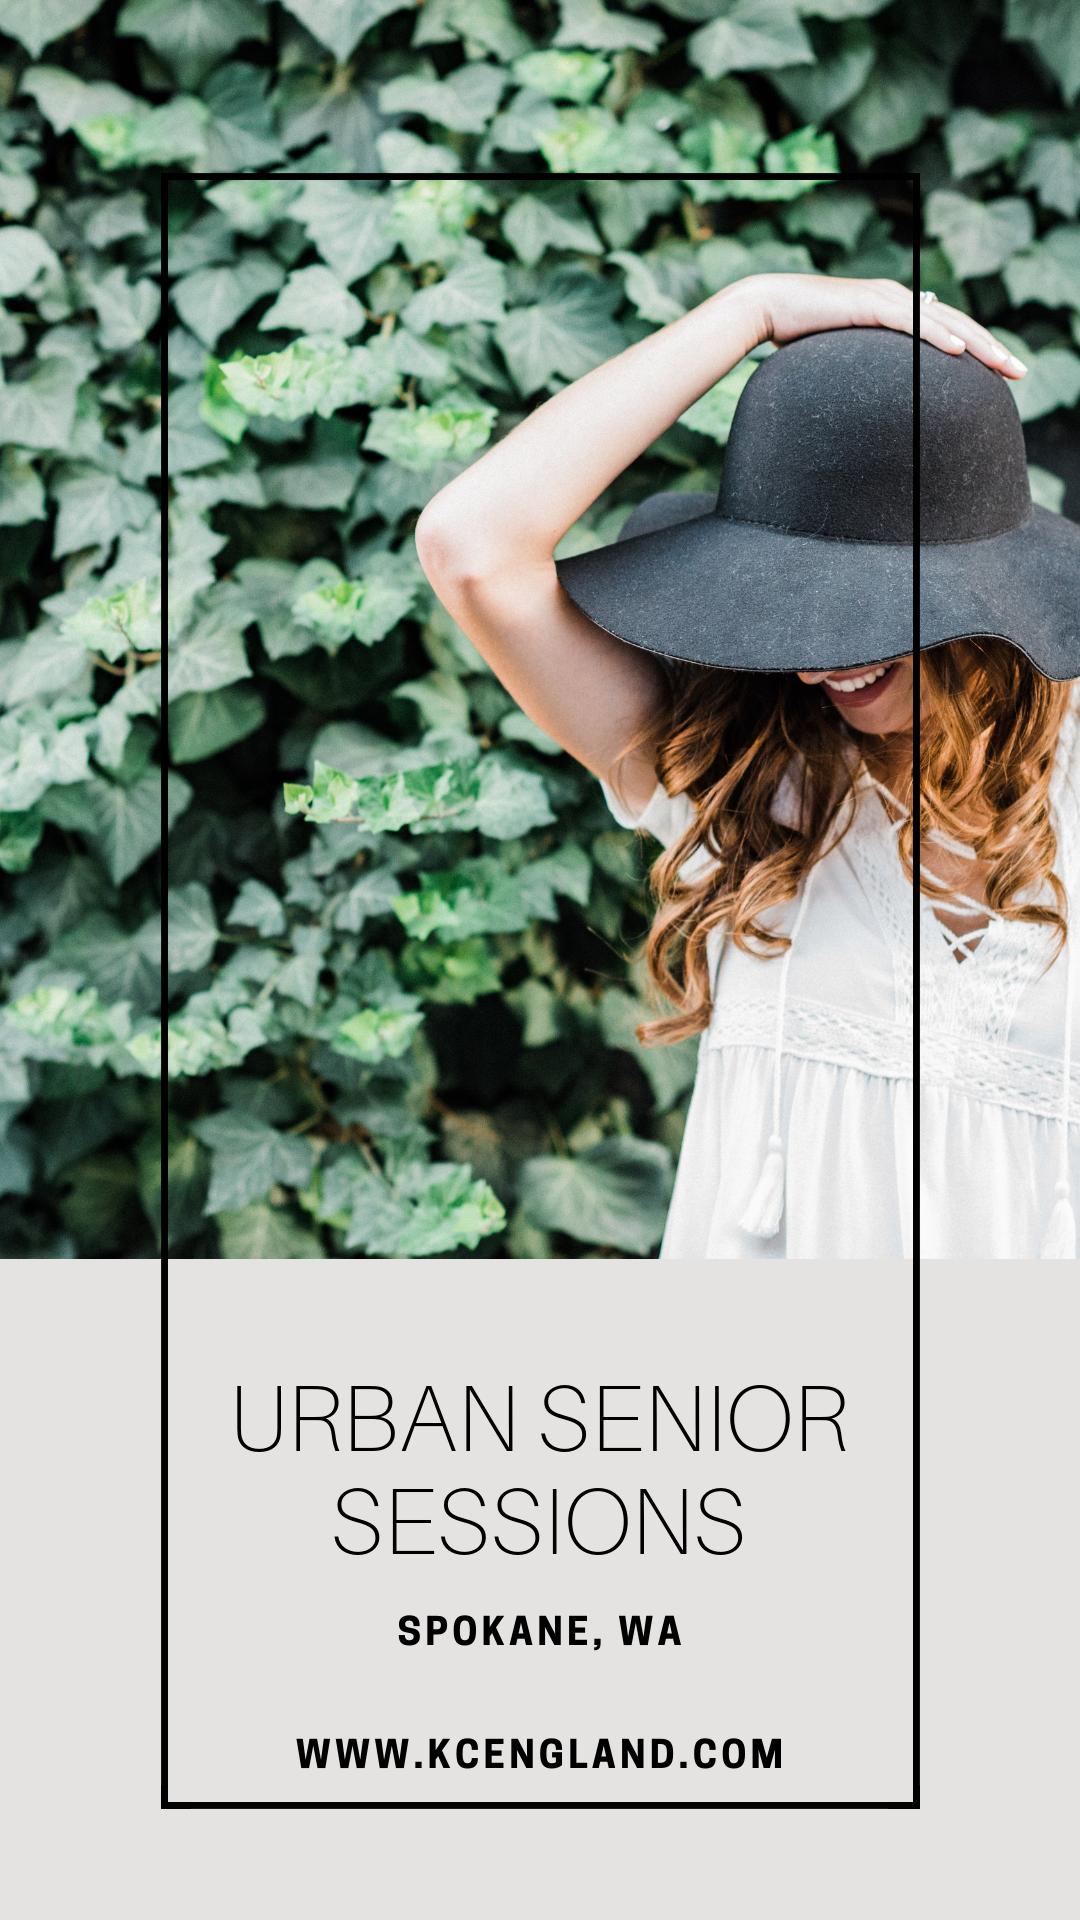 Urban Senior Sessions In Spokane, WA